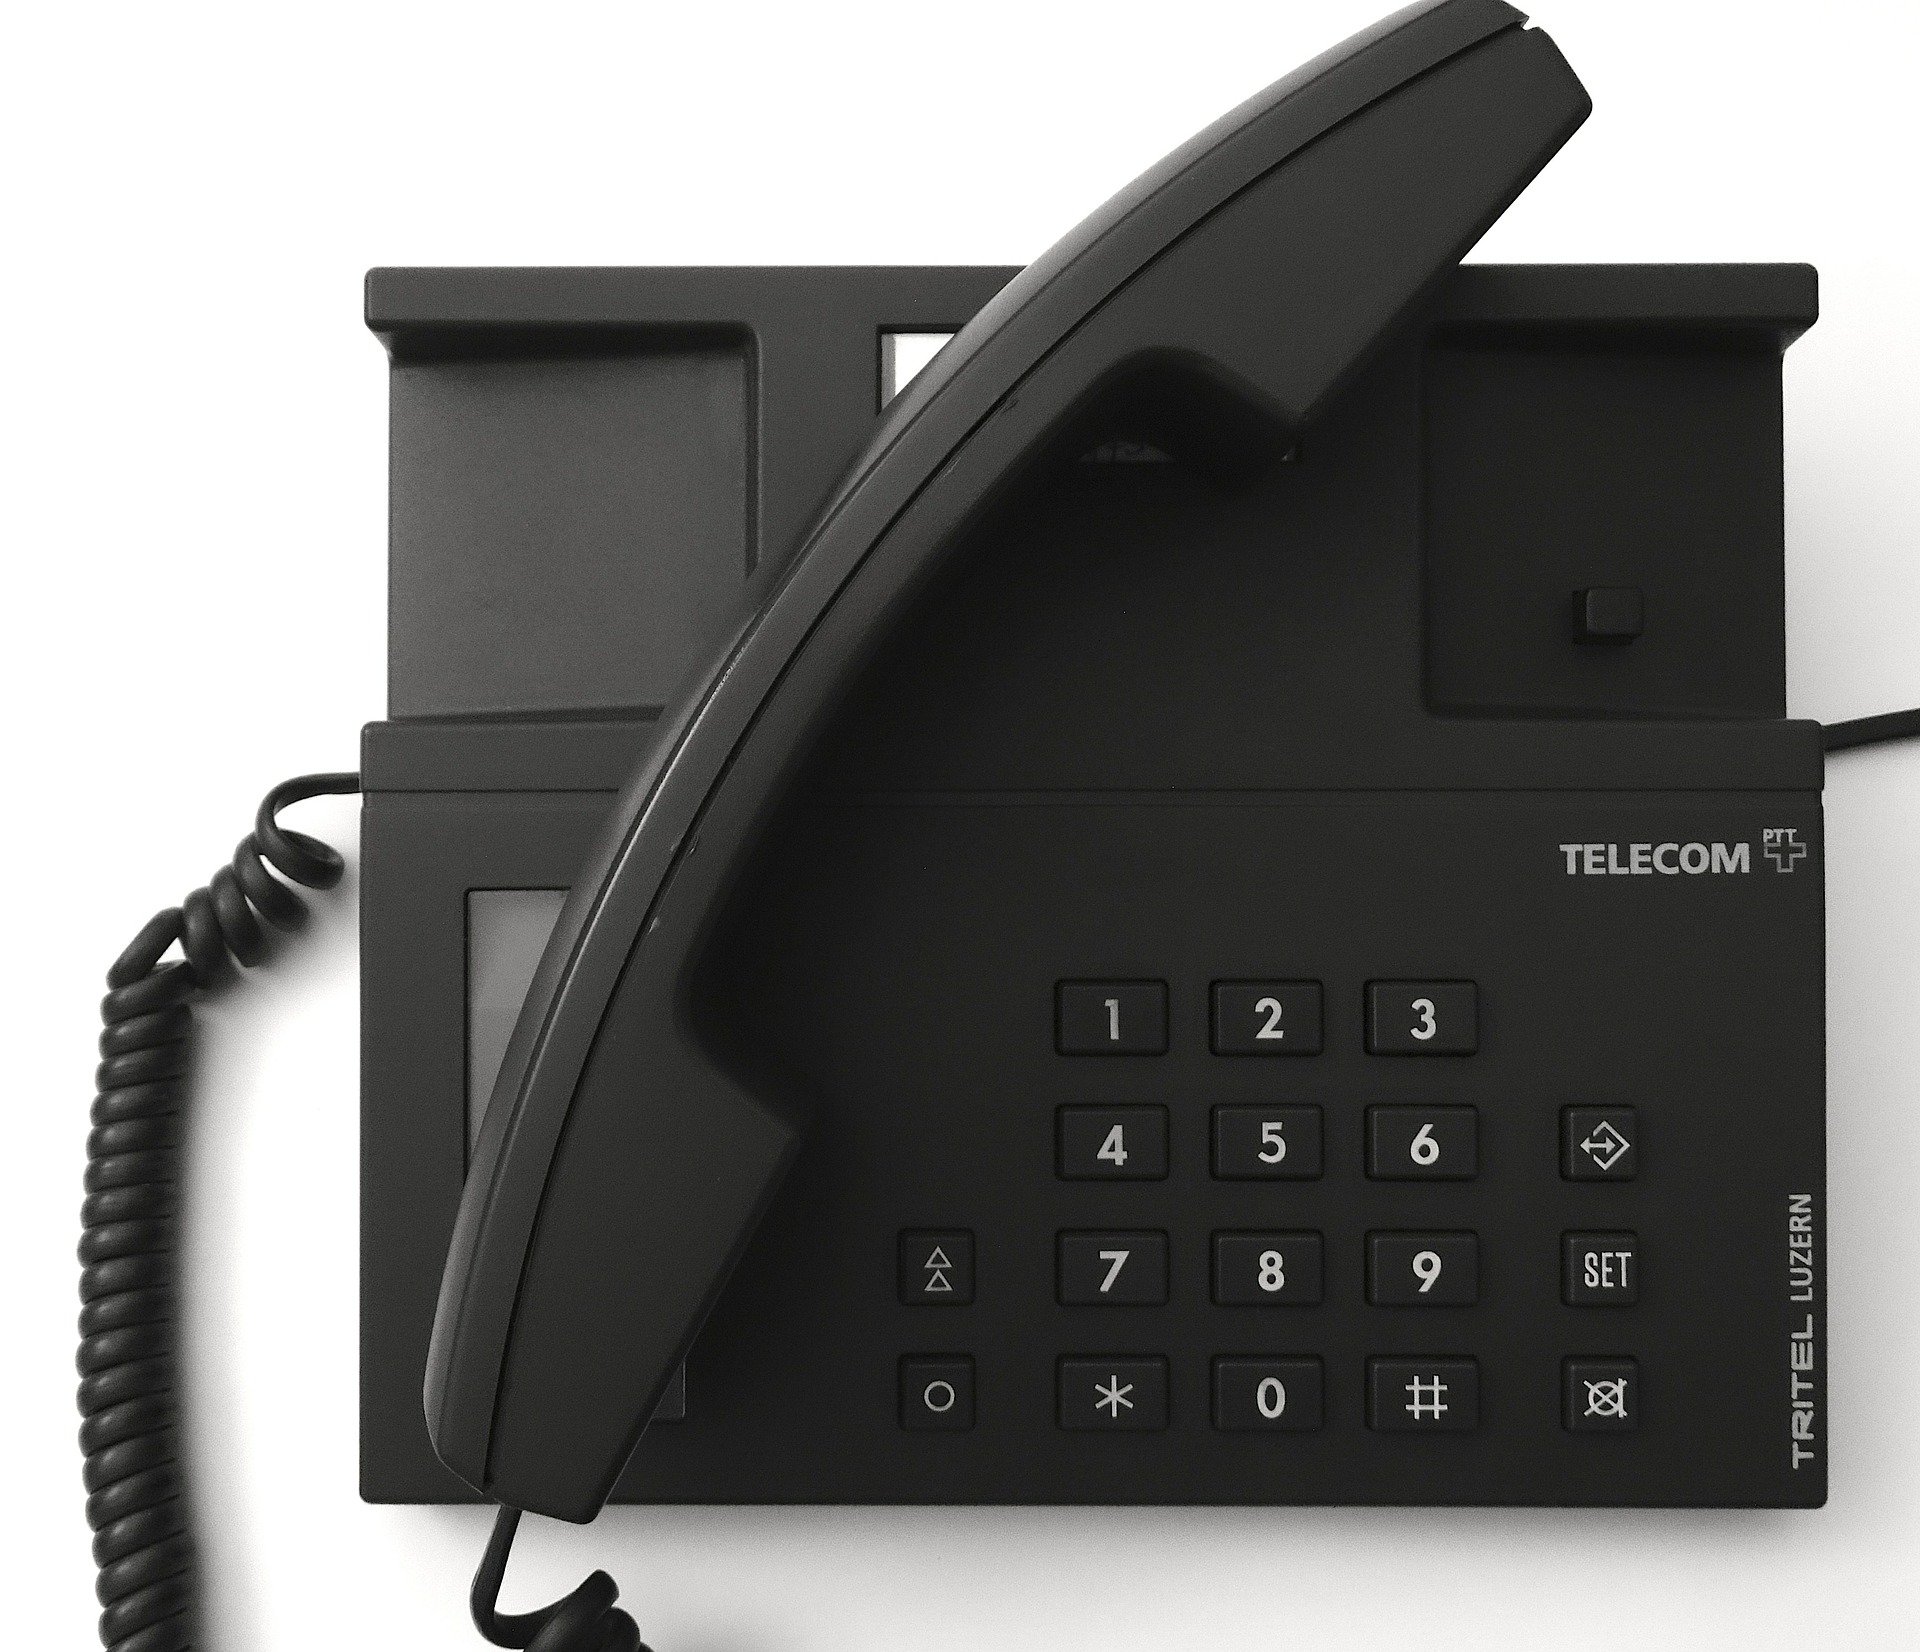 Kaltakquise München Akquise akquirieren Telefonverkauf Ulrike Knauer Verkaufsprofi Angst Telefonieren